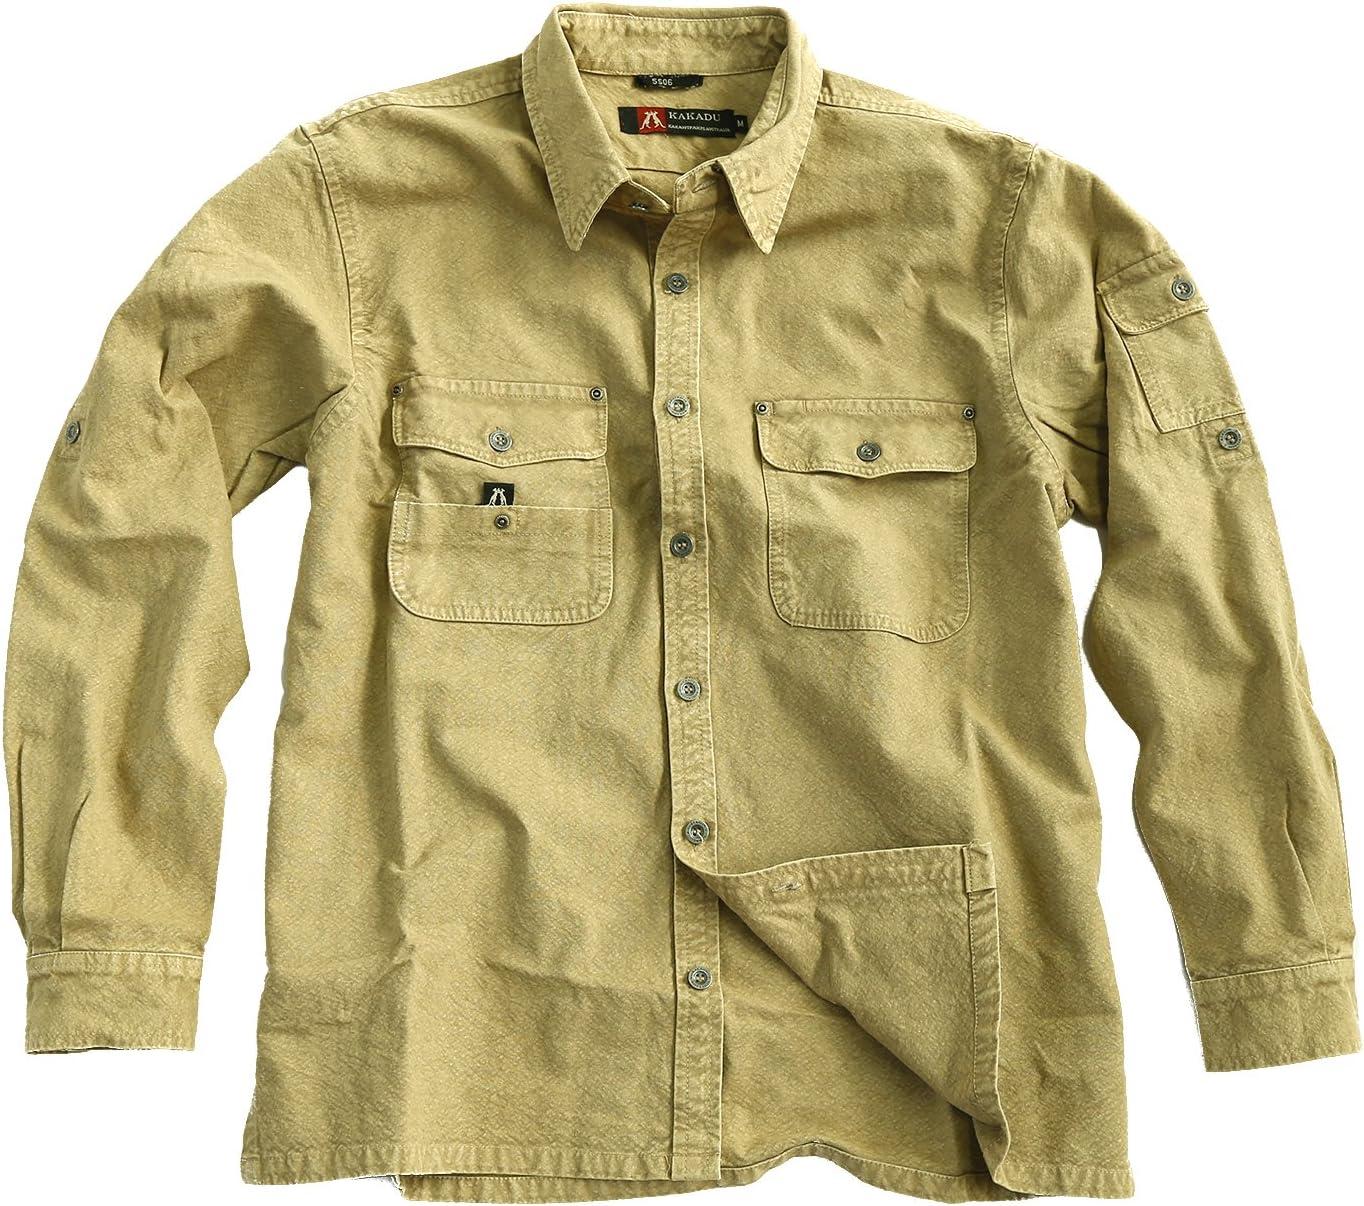 Señor Camisa de Exterior Robusta Overshirt en marrón, Mustard ...